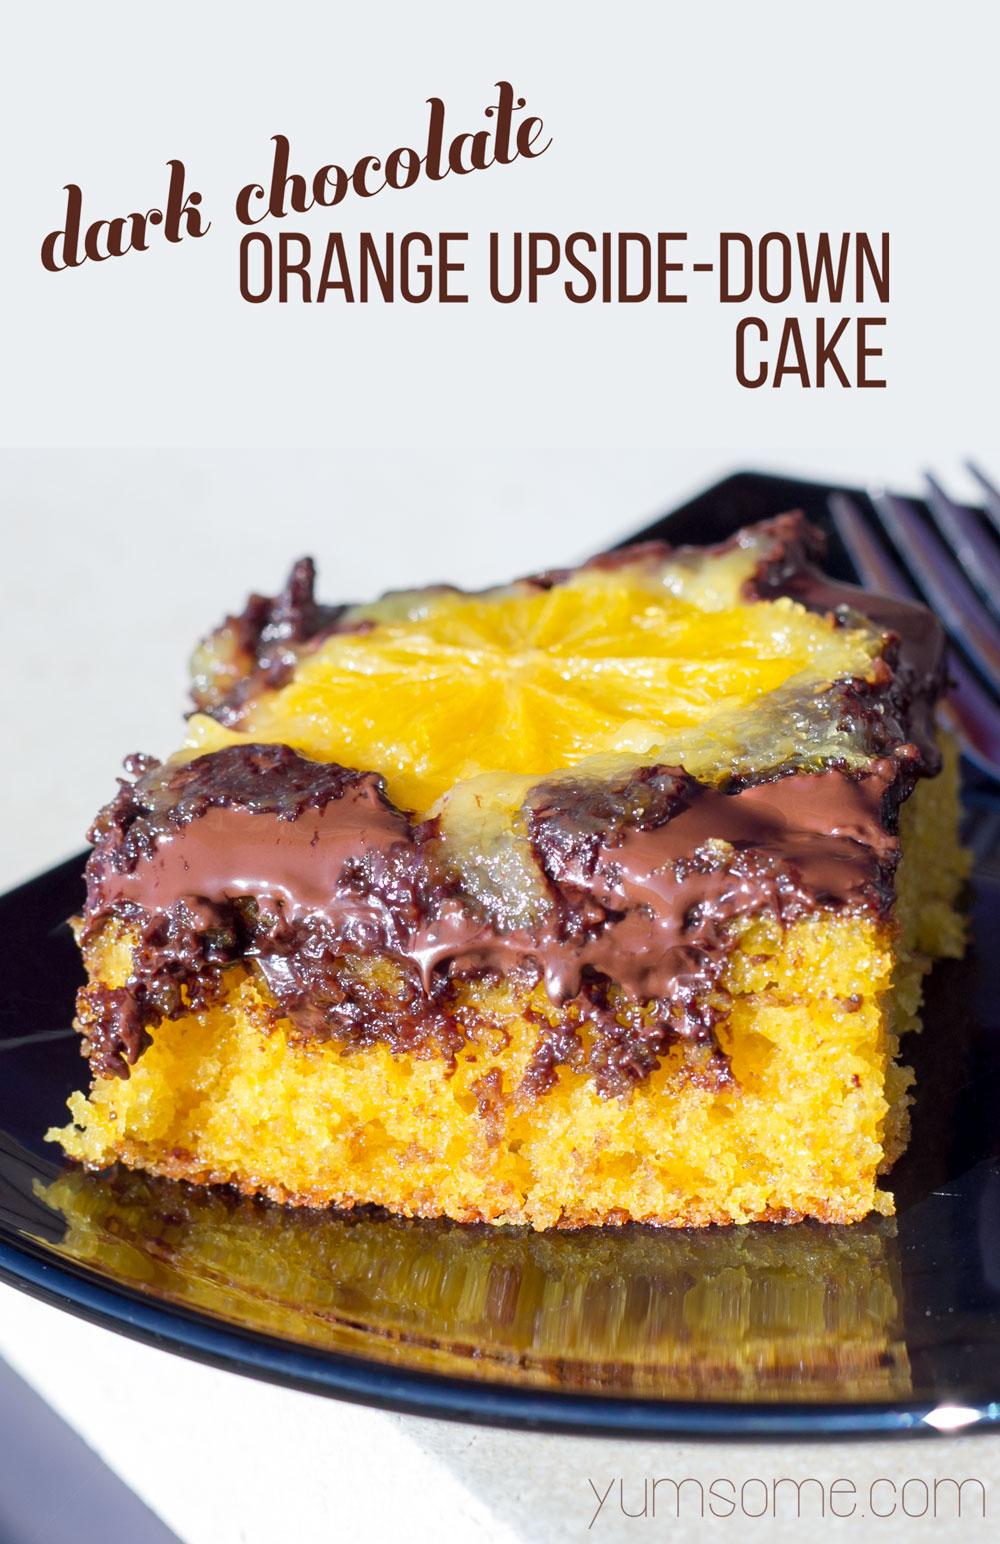 Chocolate Vegan Upside Down Cake